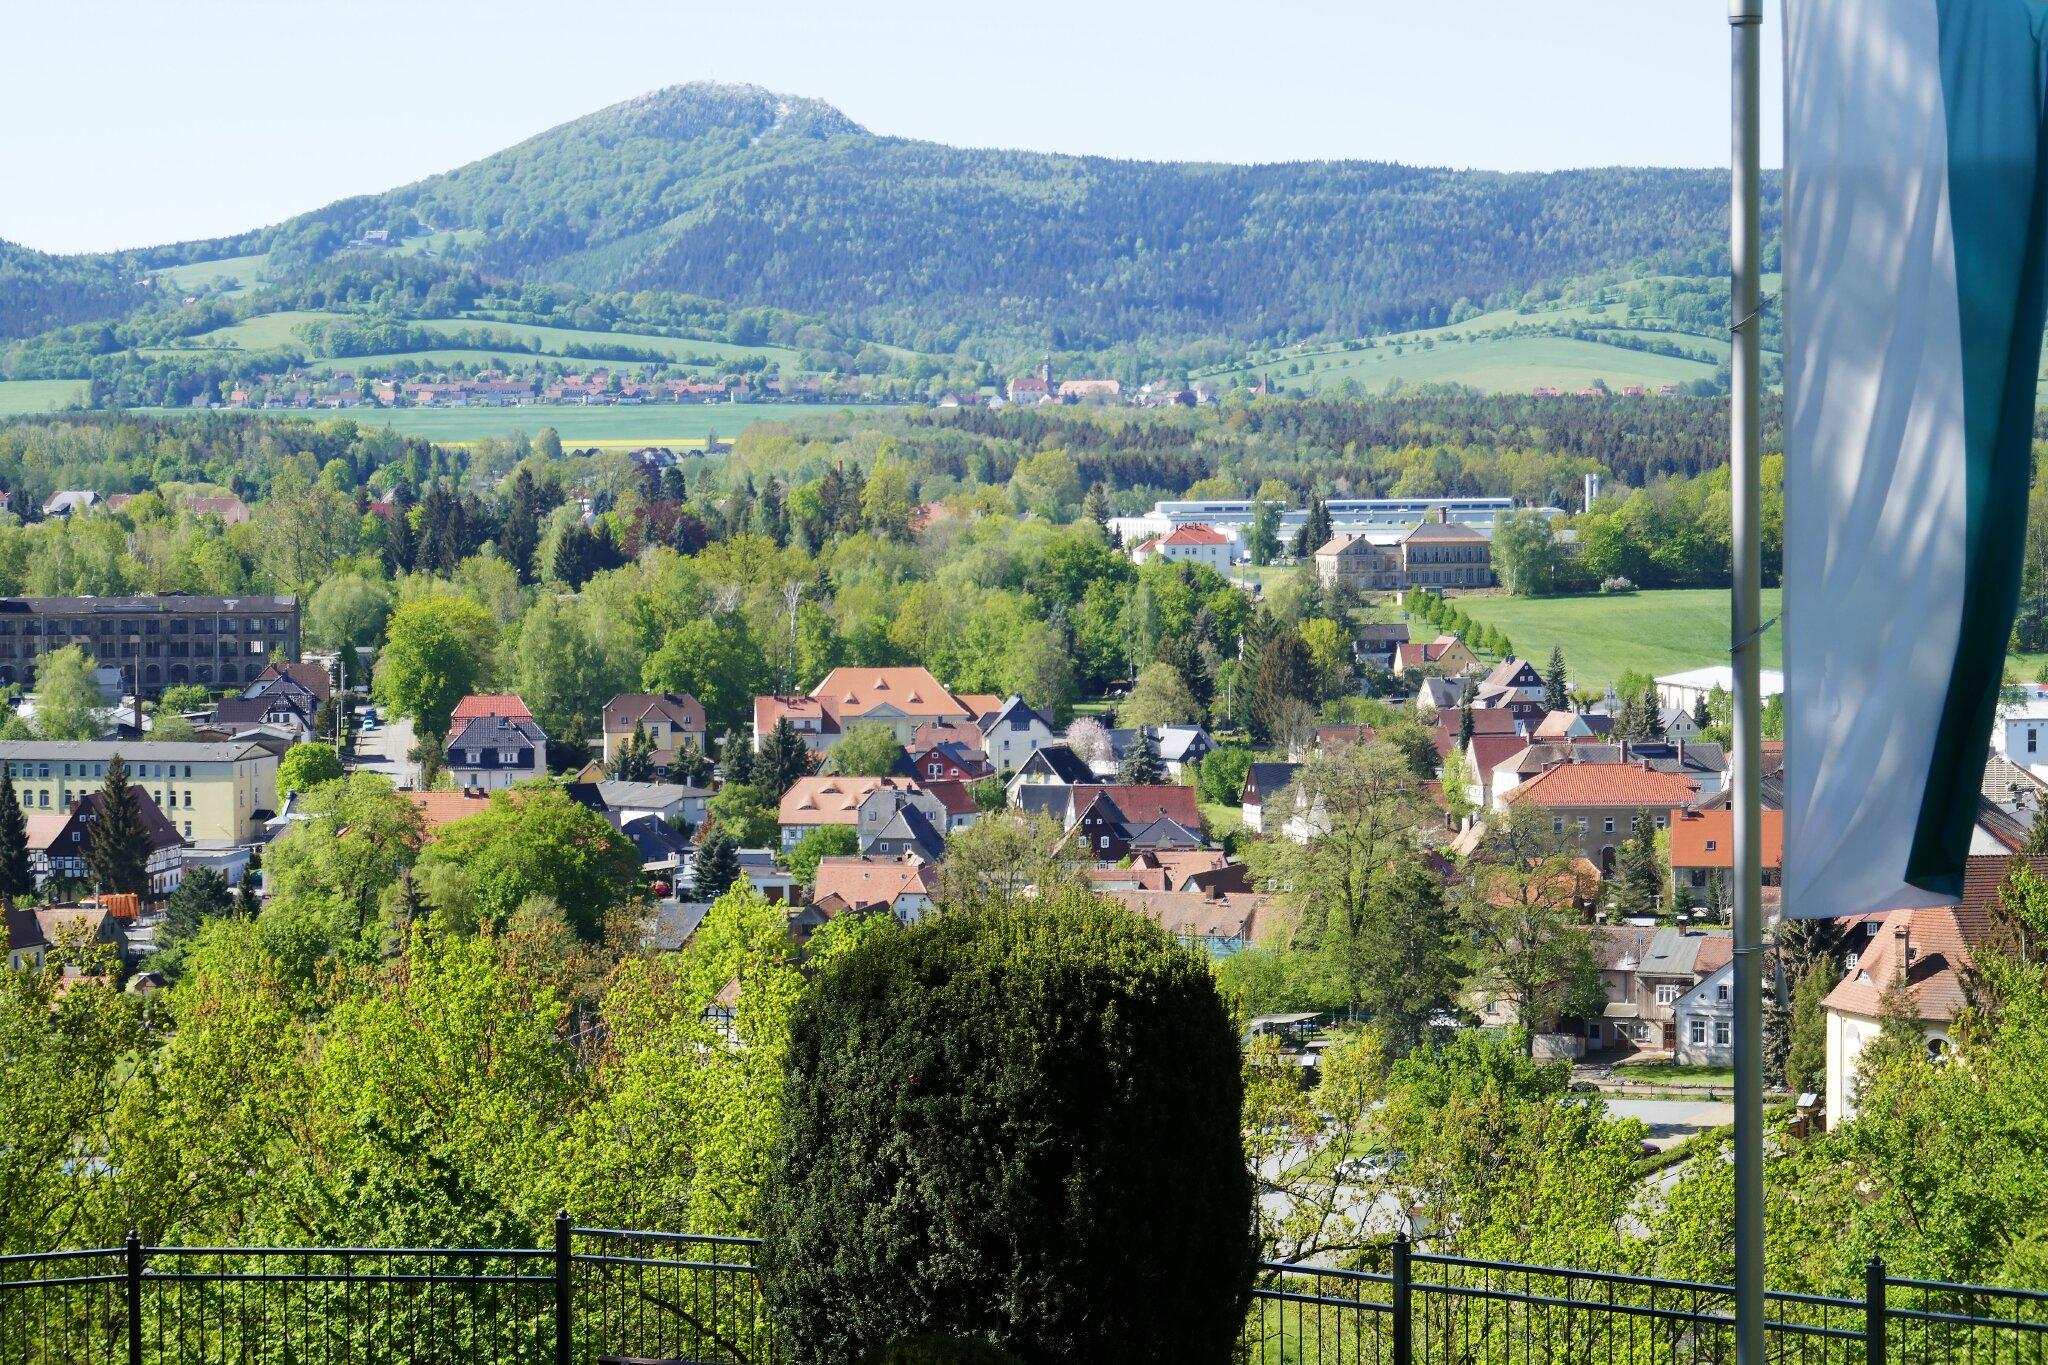 Blick vom Hutberg hinter'm Haus